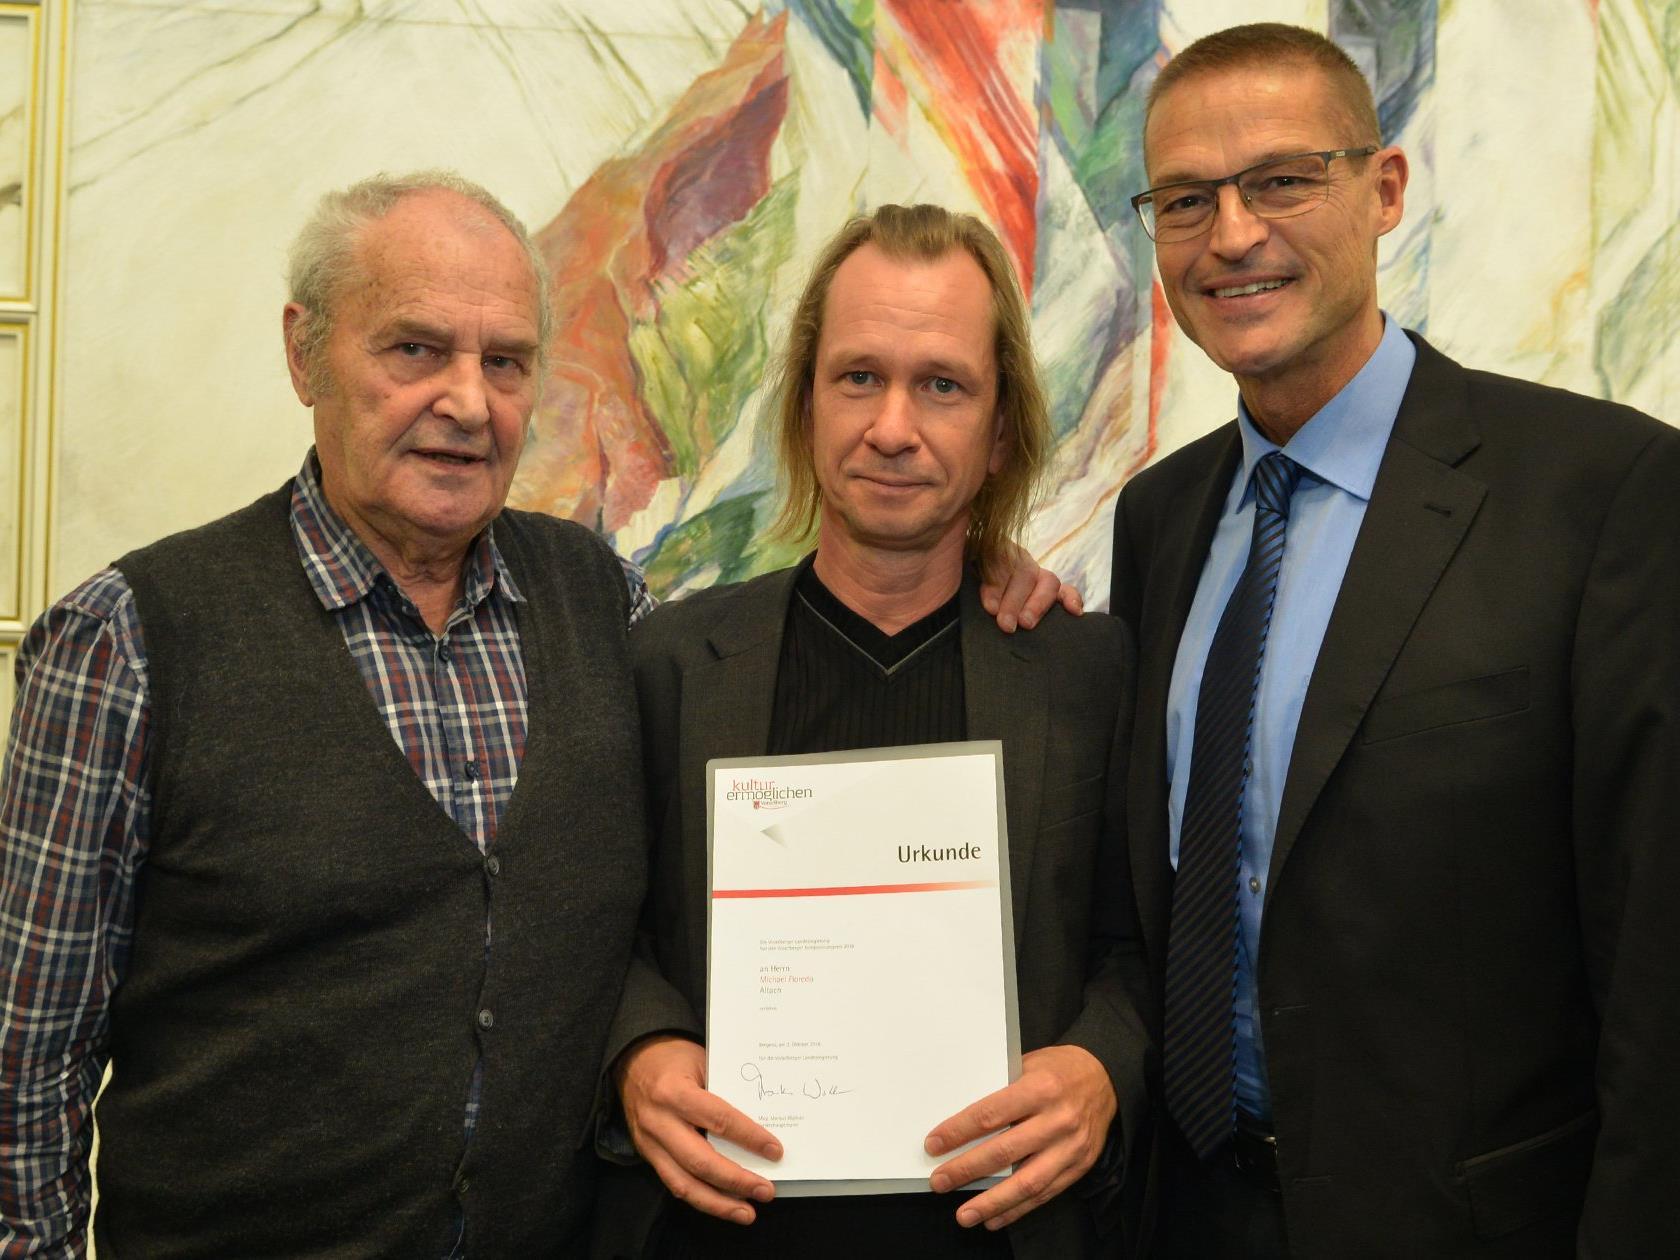 v. l. Gerold Amann, Michael Floredo, LR Dr. Christian Bernhard